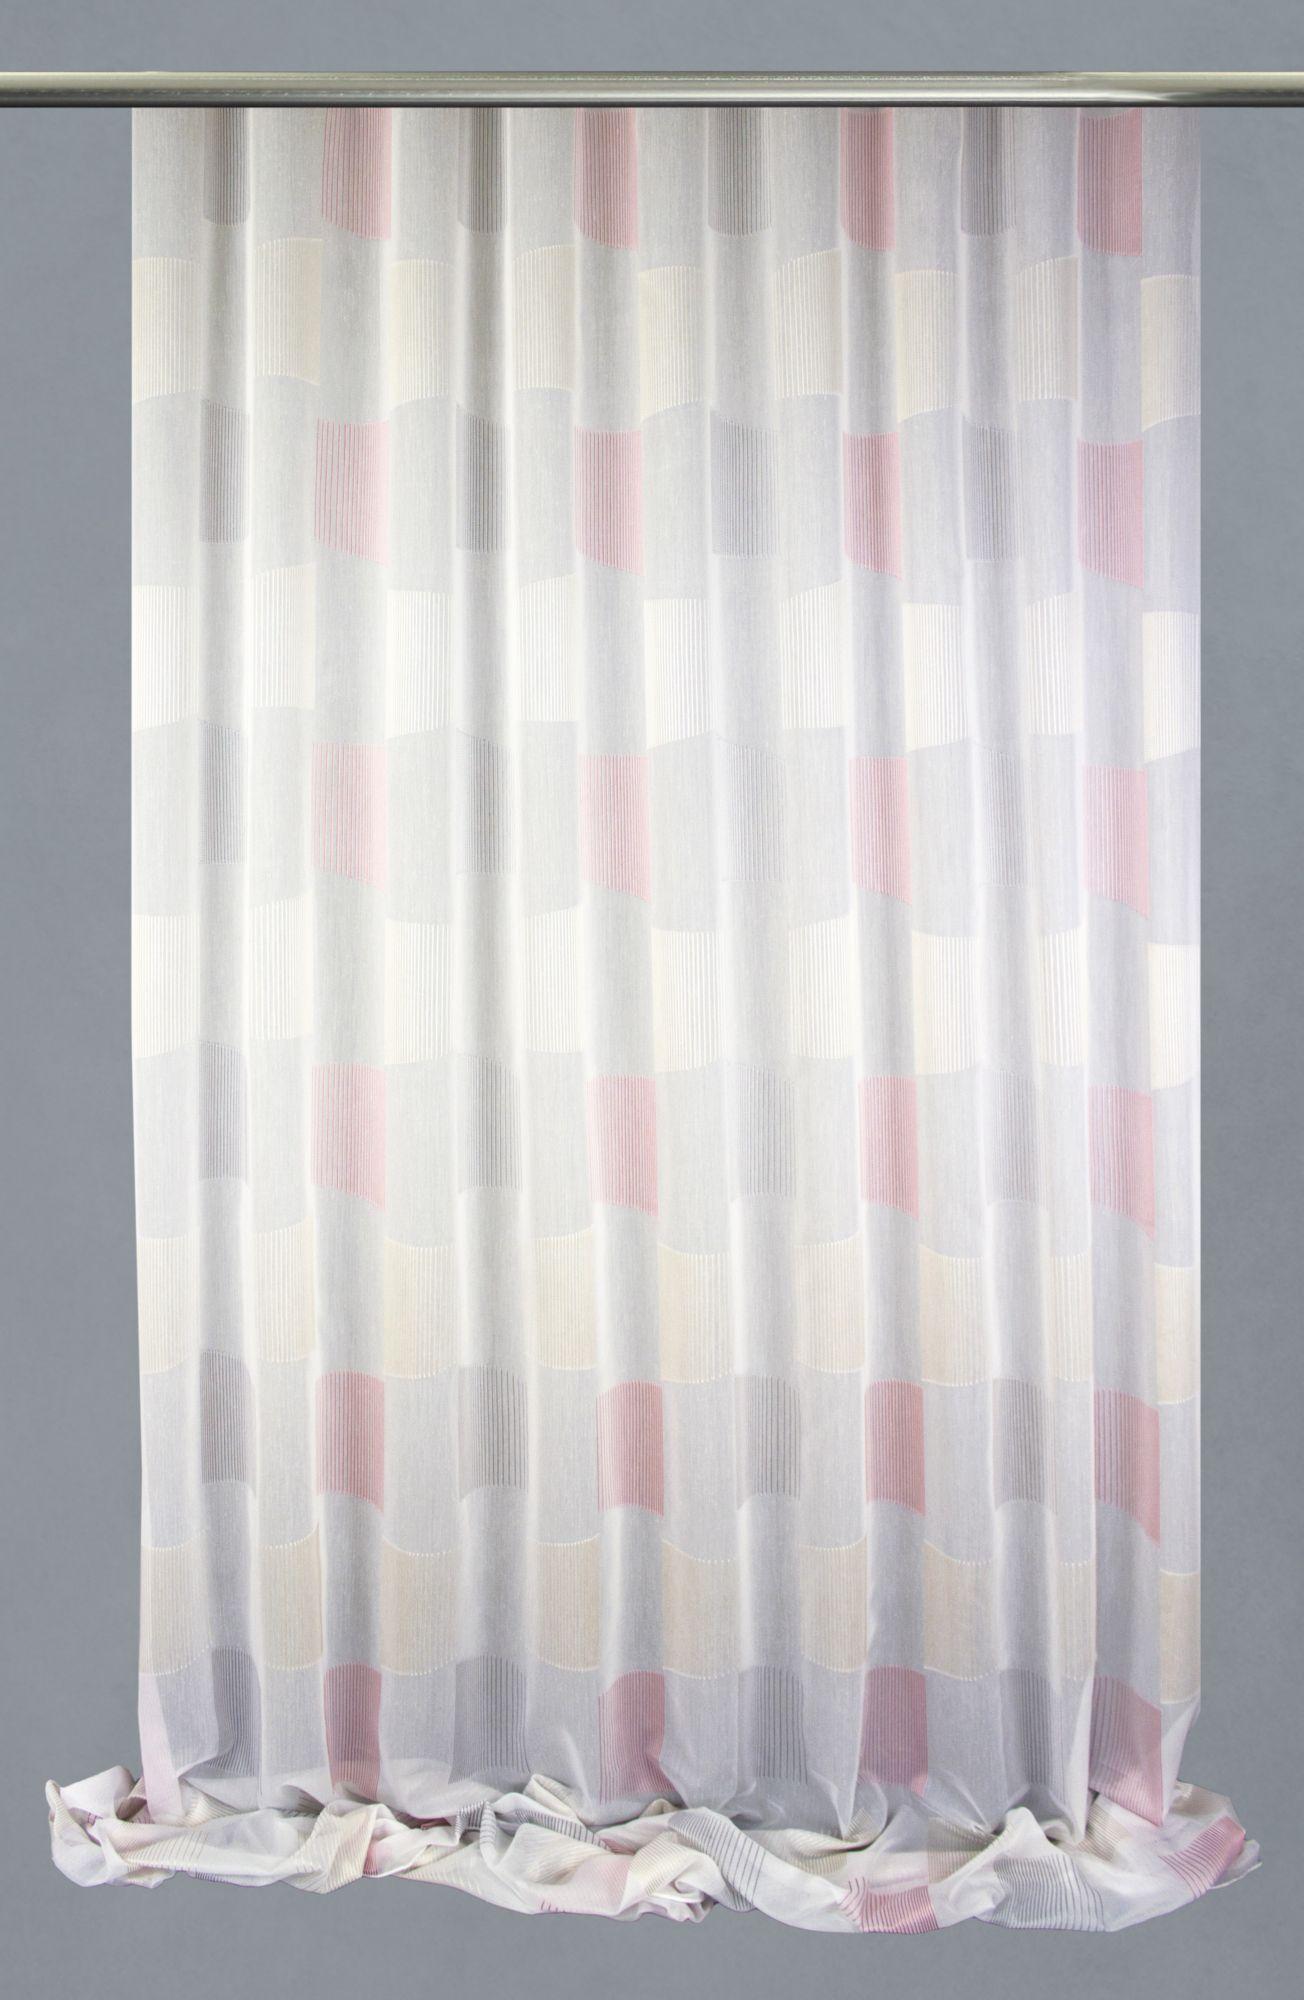 gardine nach ma vhg trajan schwab versand. Black Bedroom Furniture Sets. Home Design Ideas